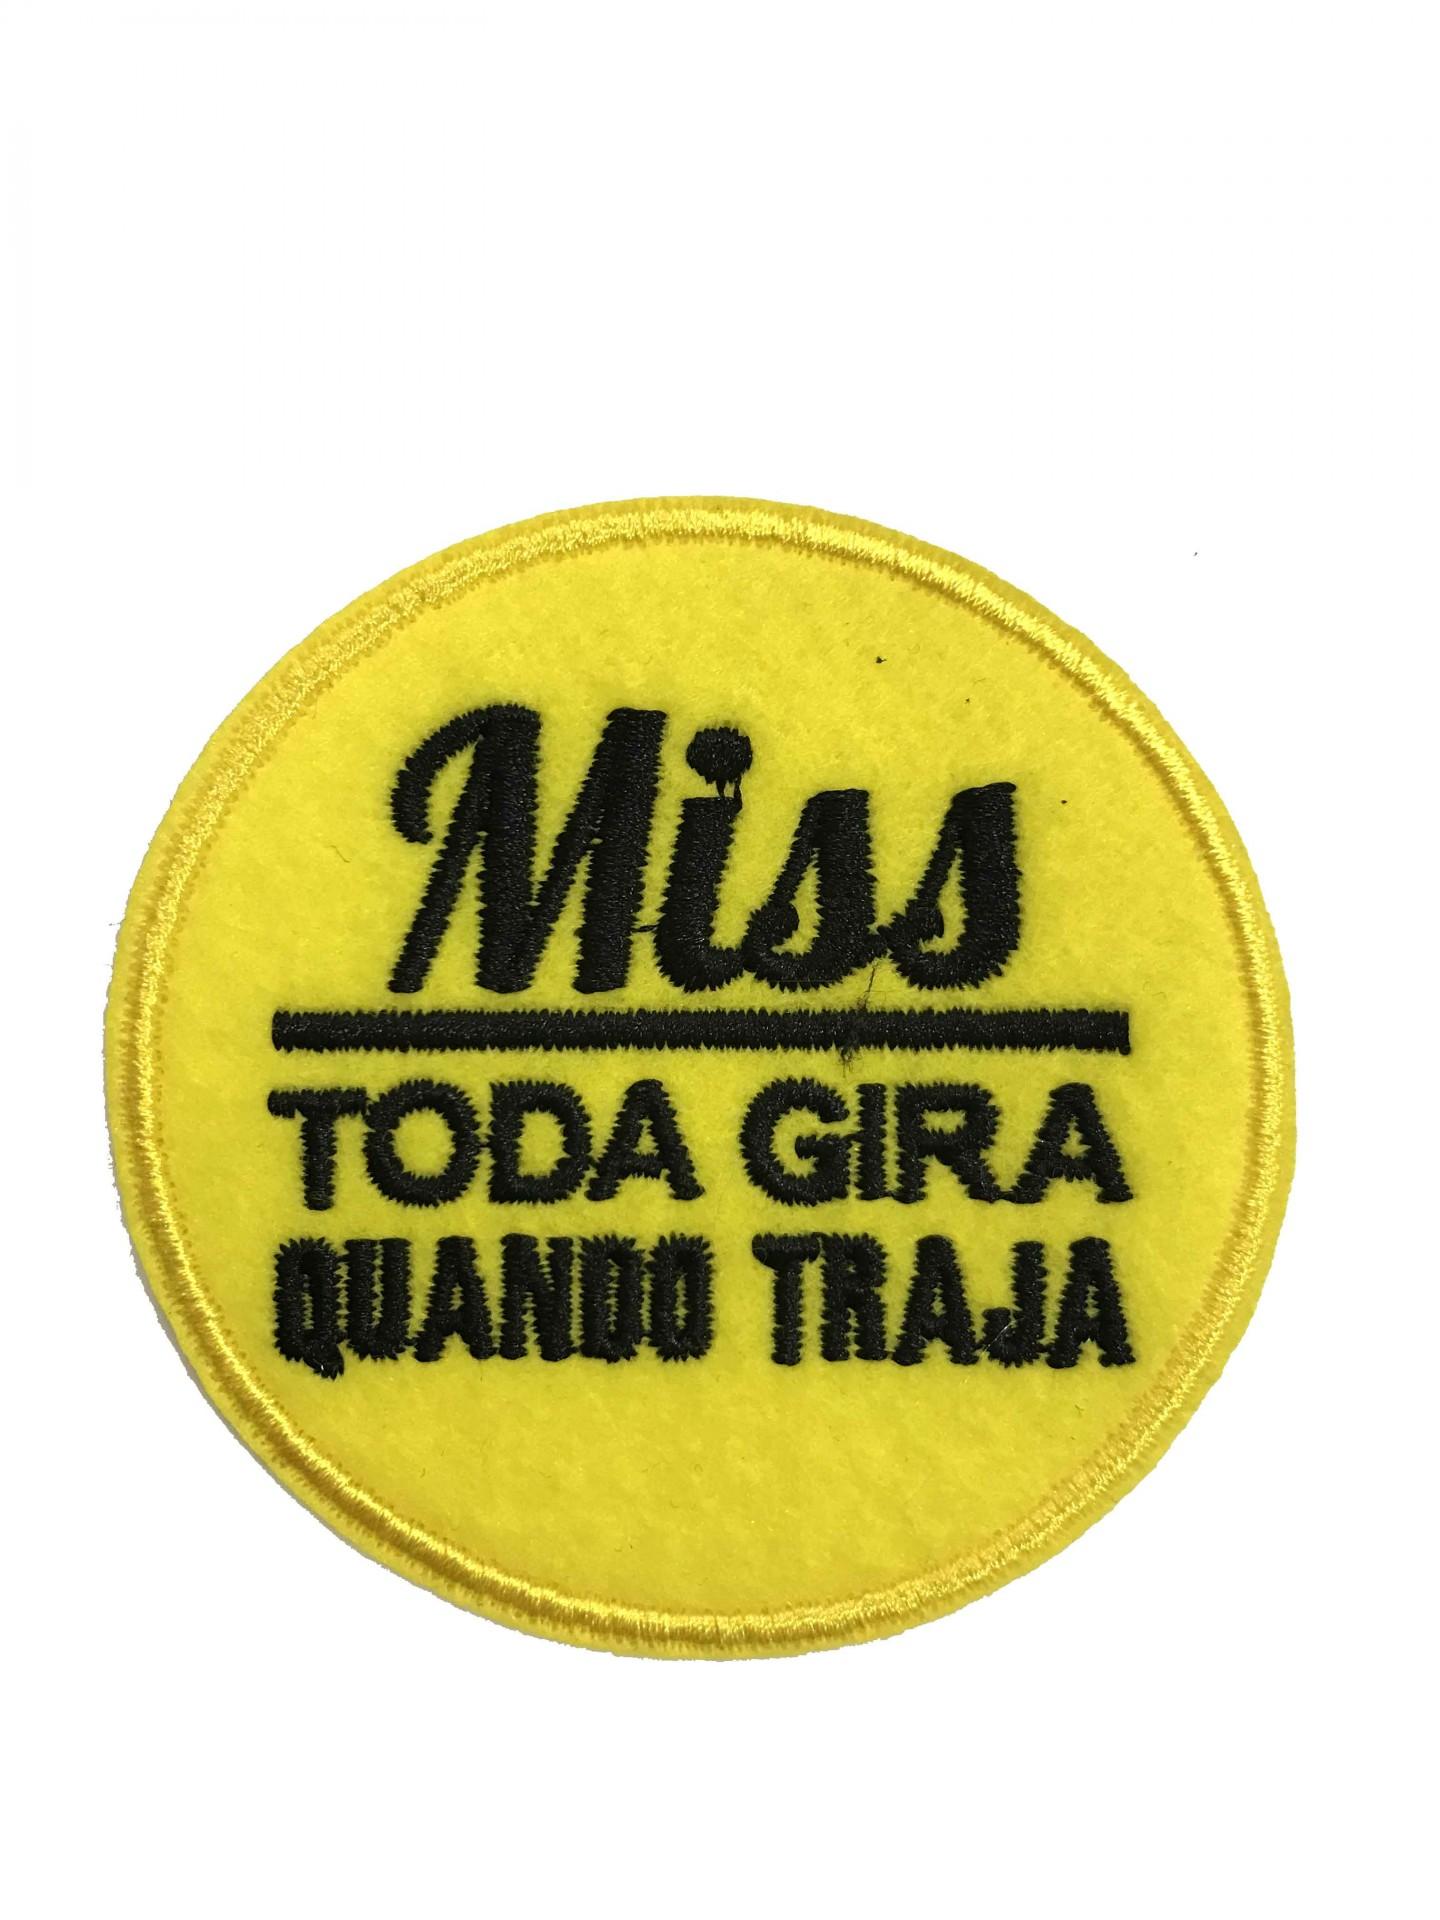 Emblema Miss toda gira quando traja